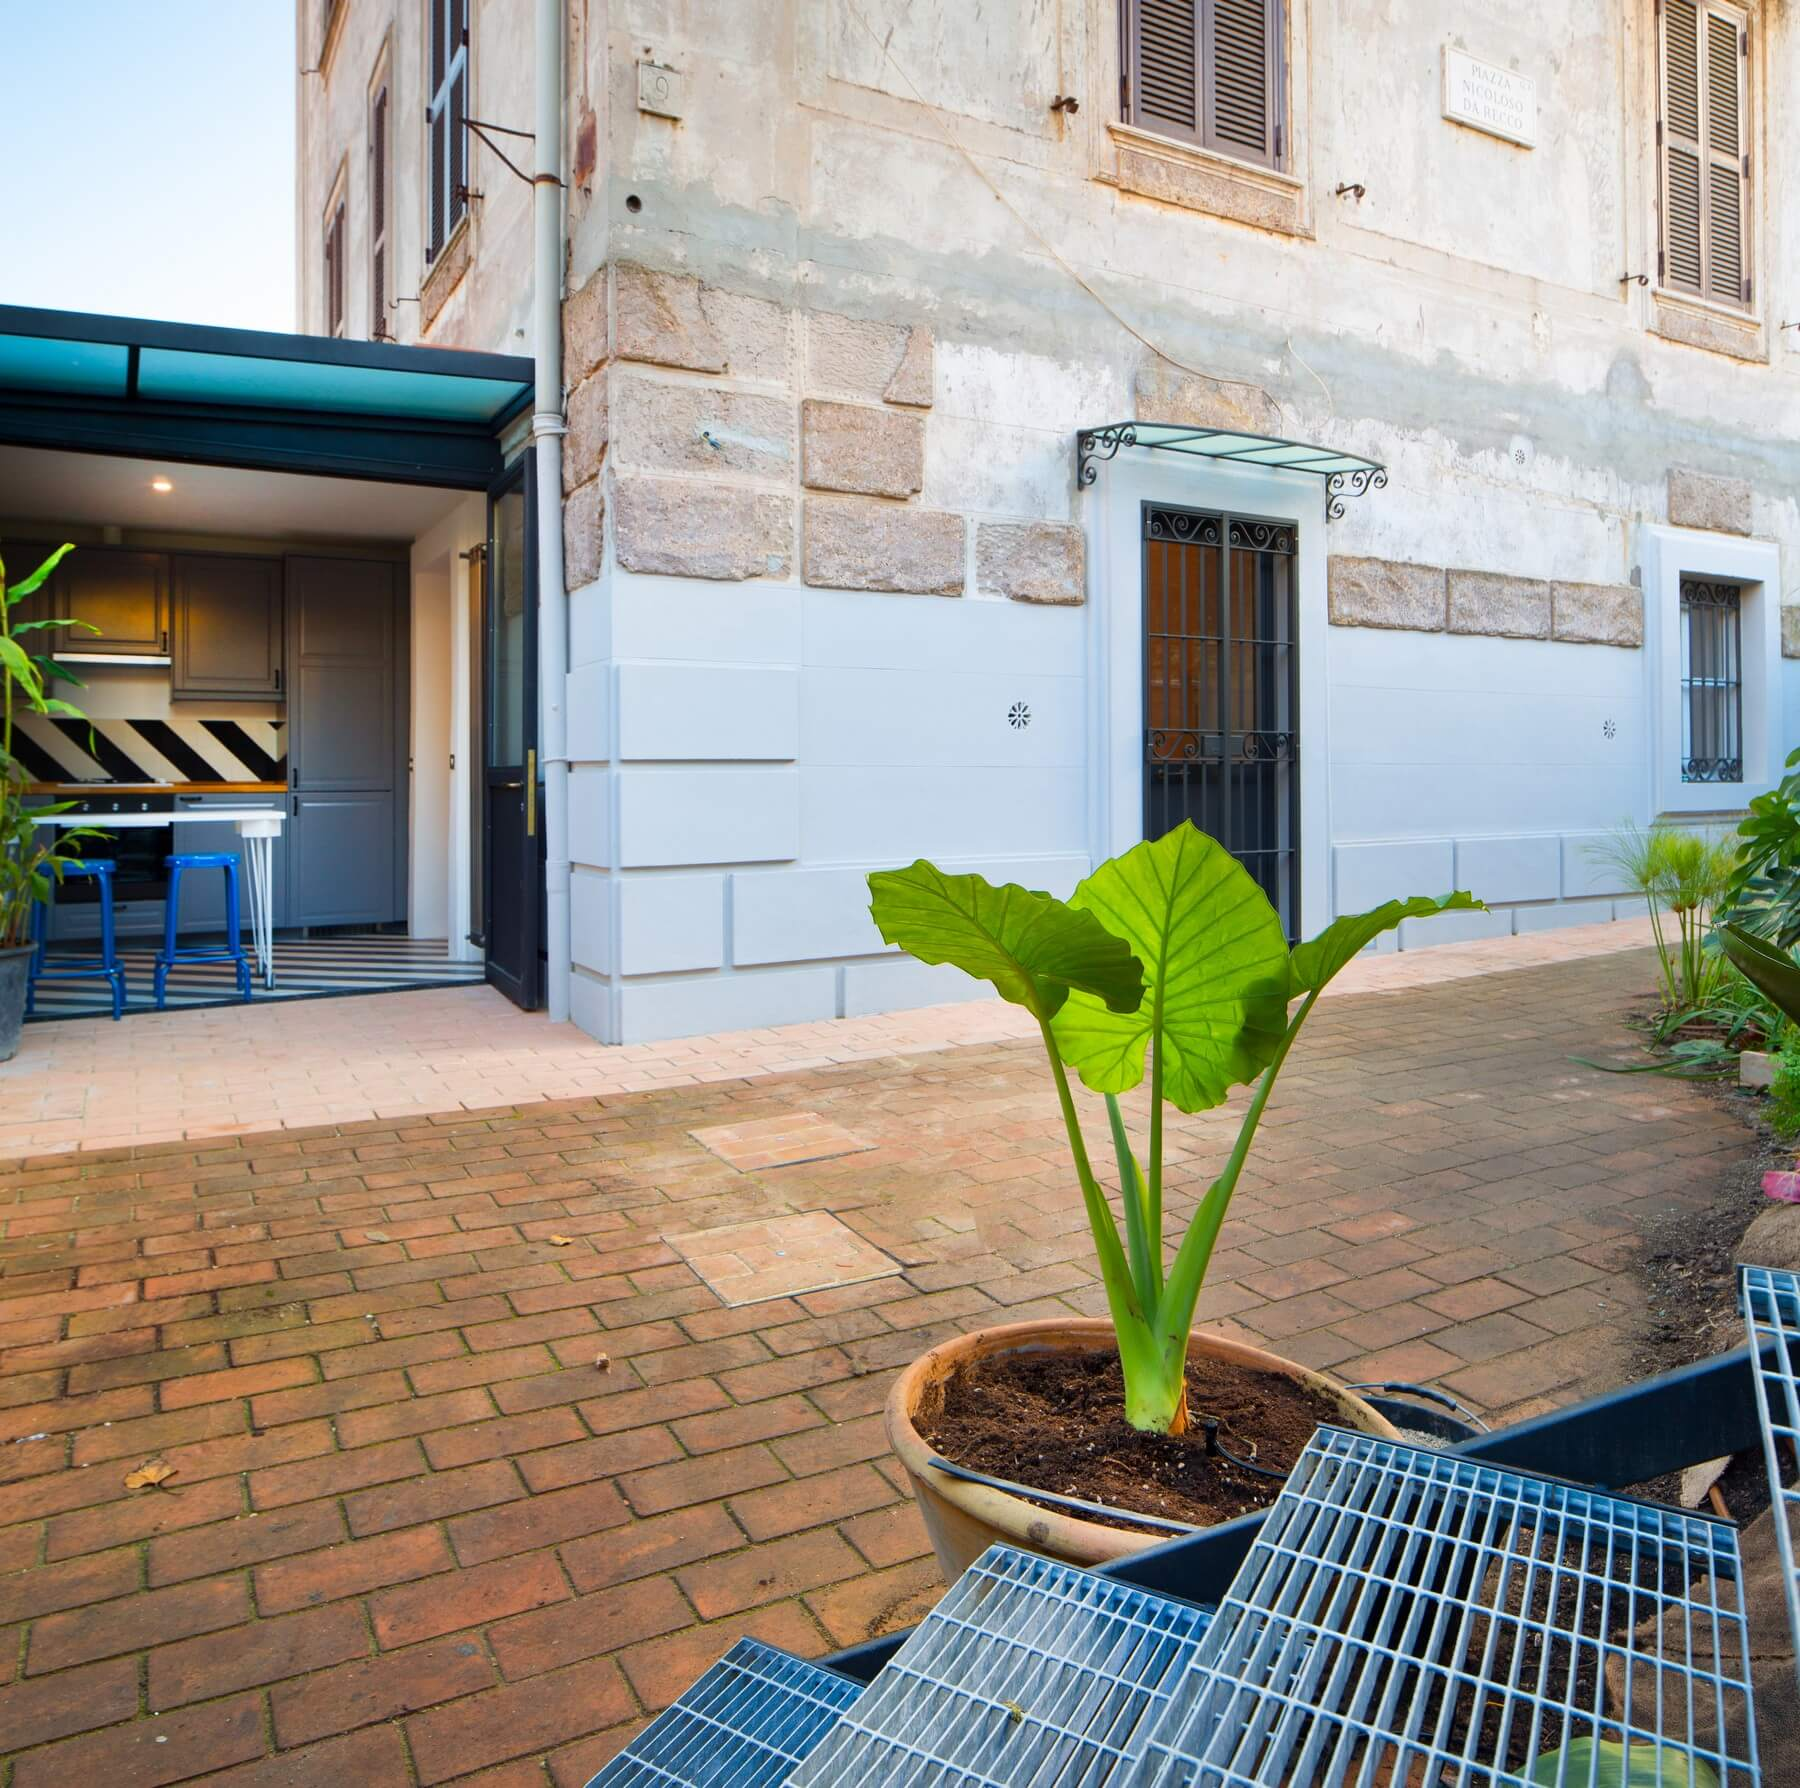 Appartamento san saba roma architetto morgantini 1 for Architetto giardini roma